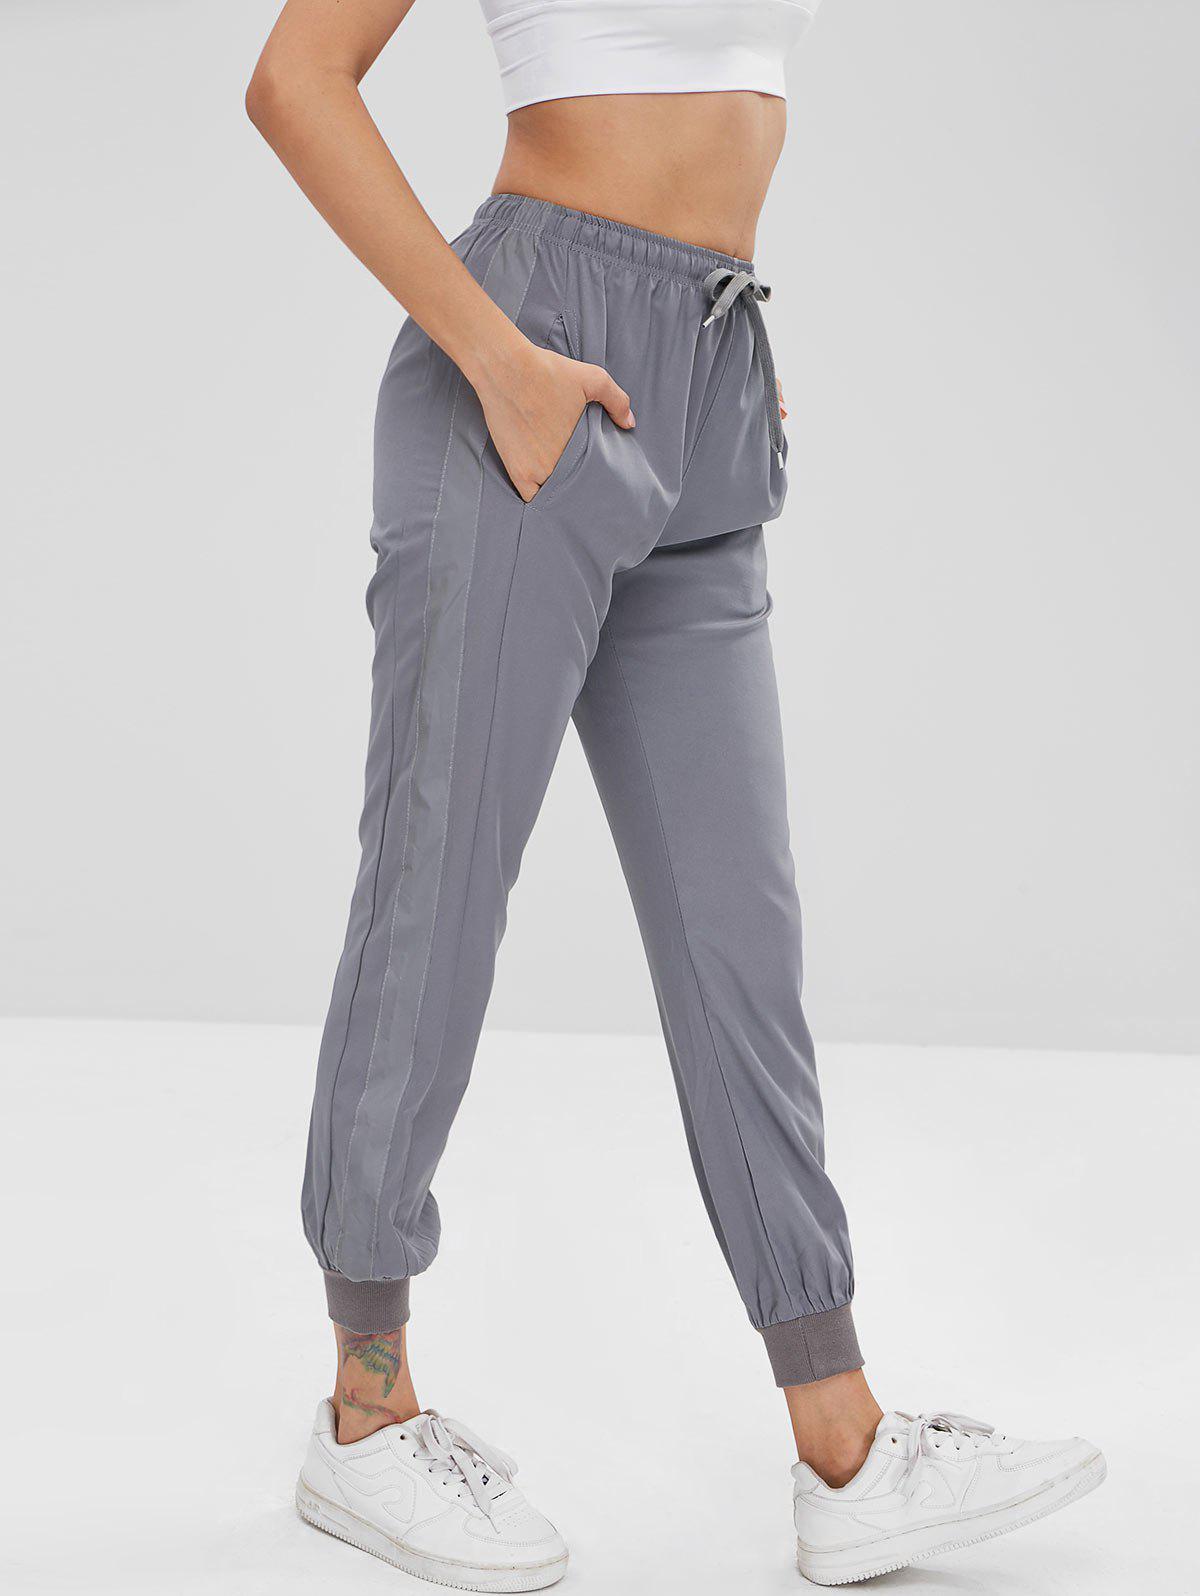 Купить со скидкой Striped Side Drawstring Jogger Pants